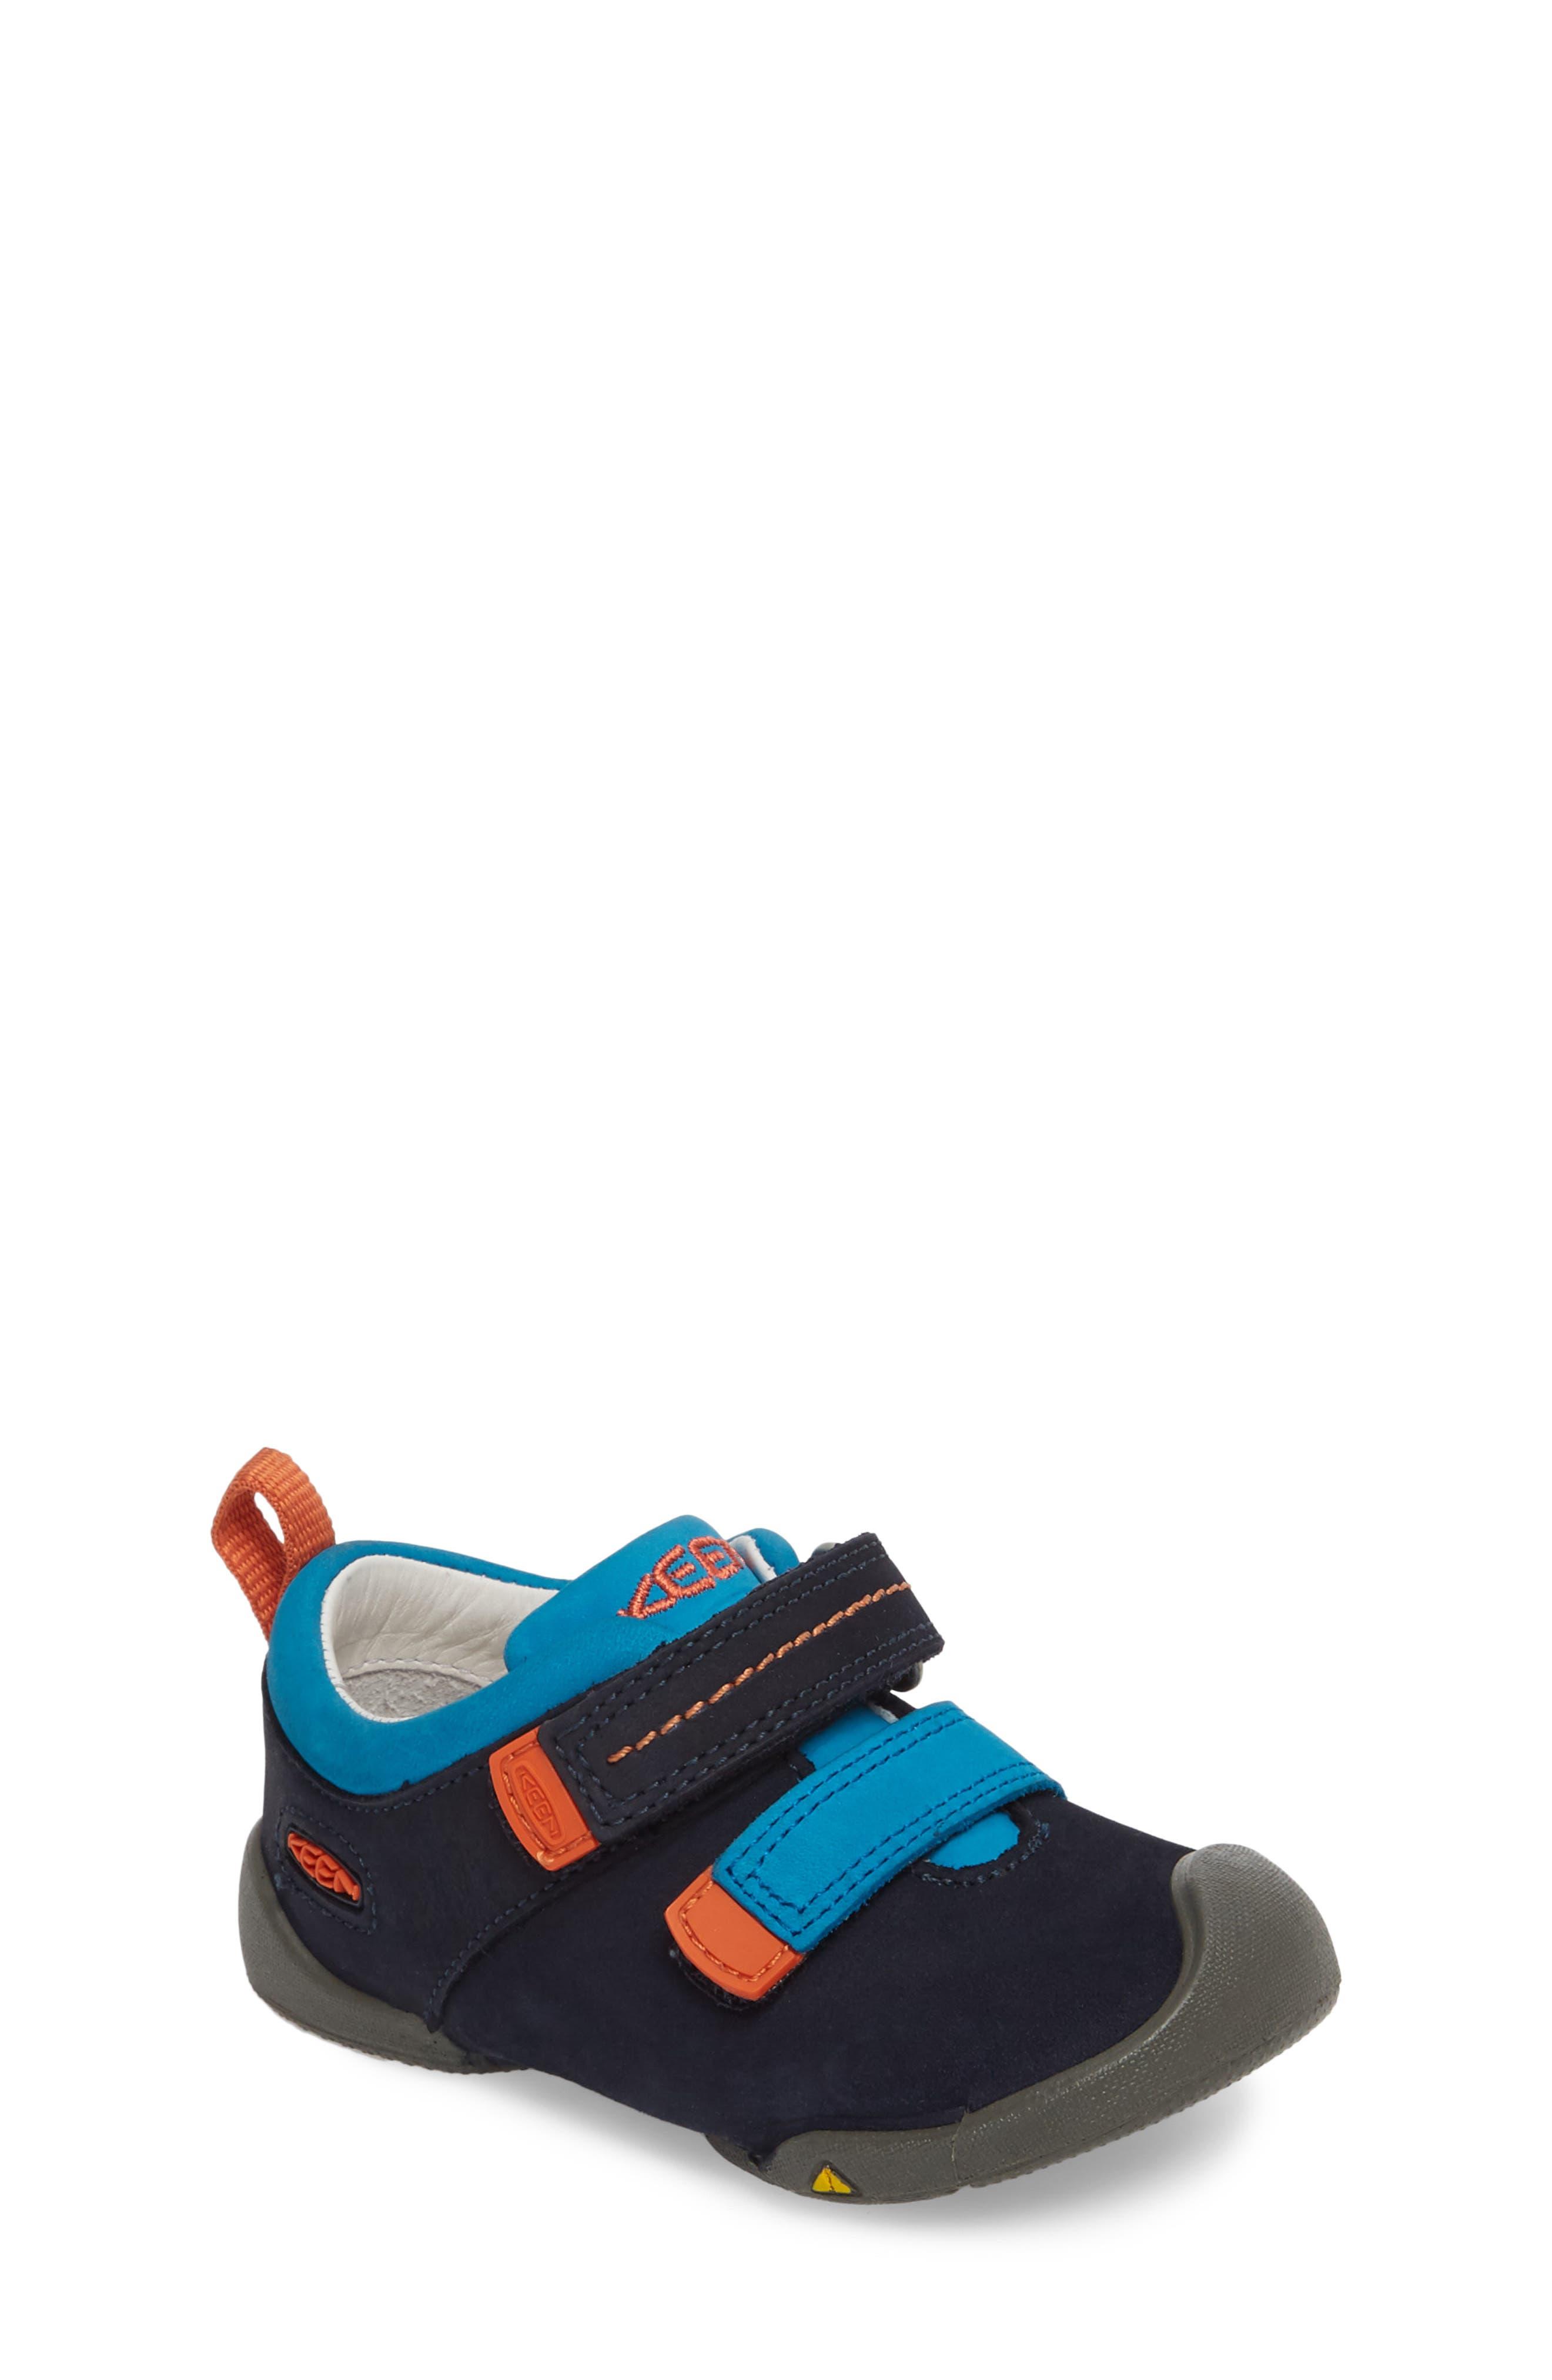 Pep Double Strap-T Sneaker,                             Main thumbnail 1, color,                             Dress Blues/ Koi